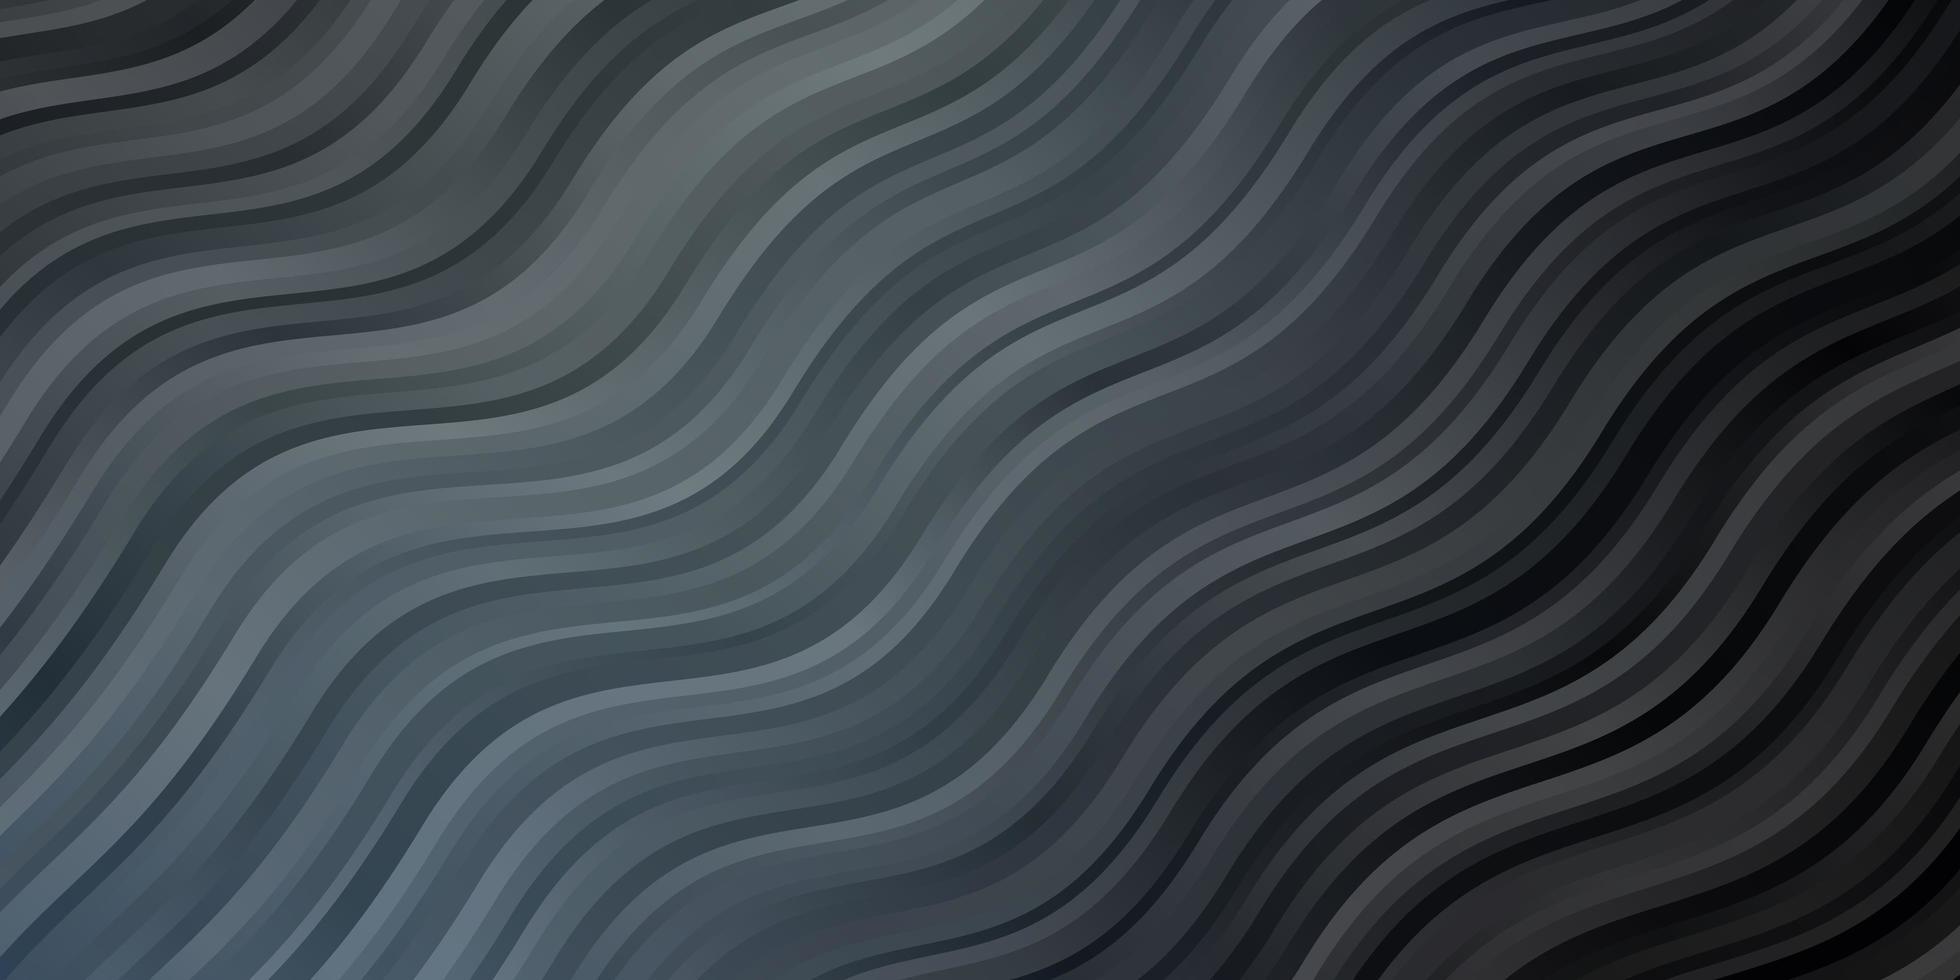 diseño vectorial gris claro con líneas torcidas. vector